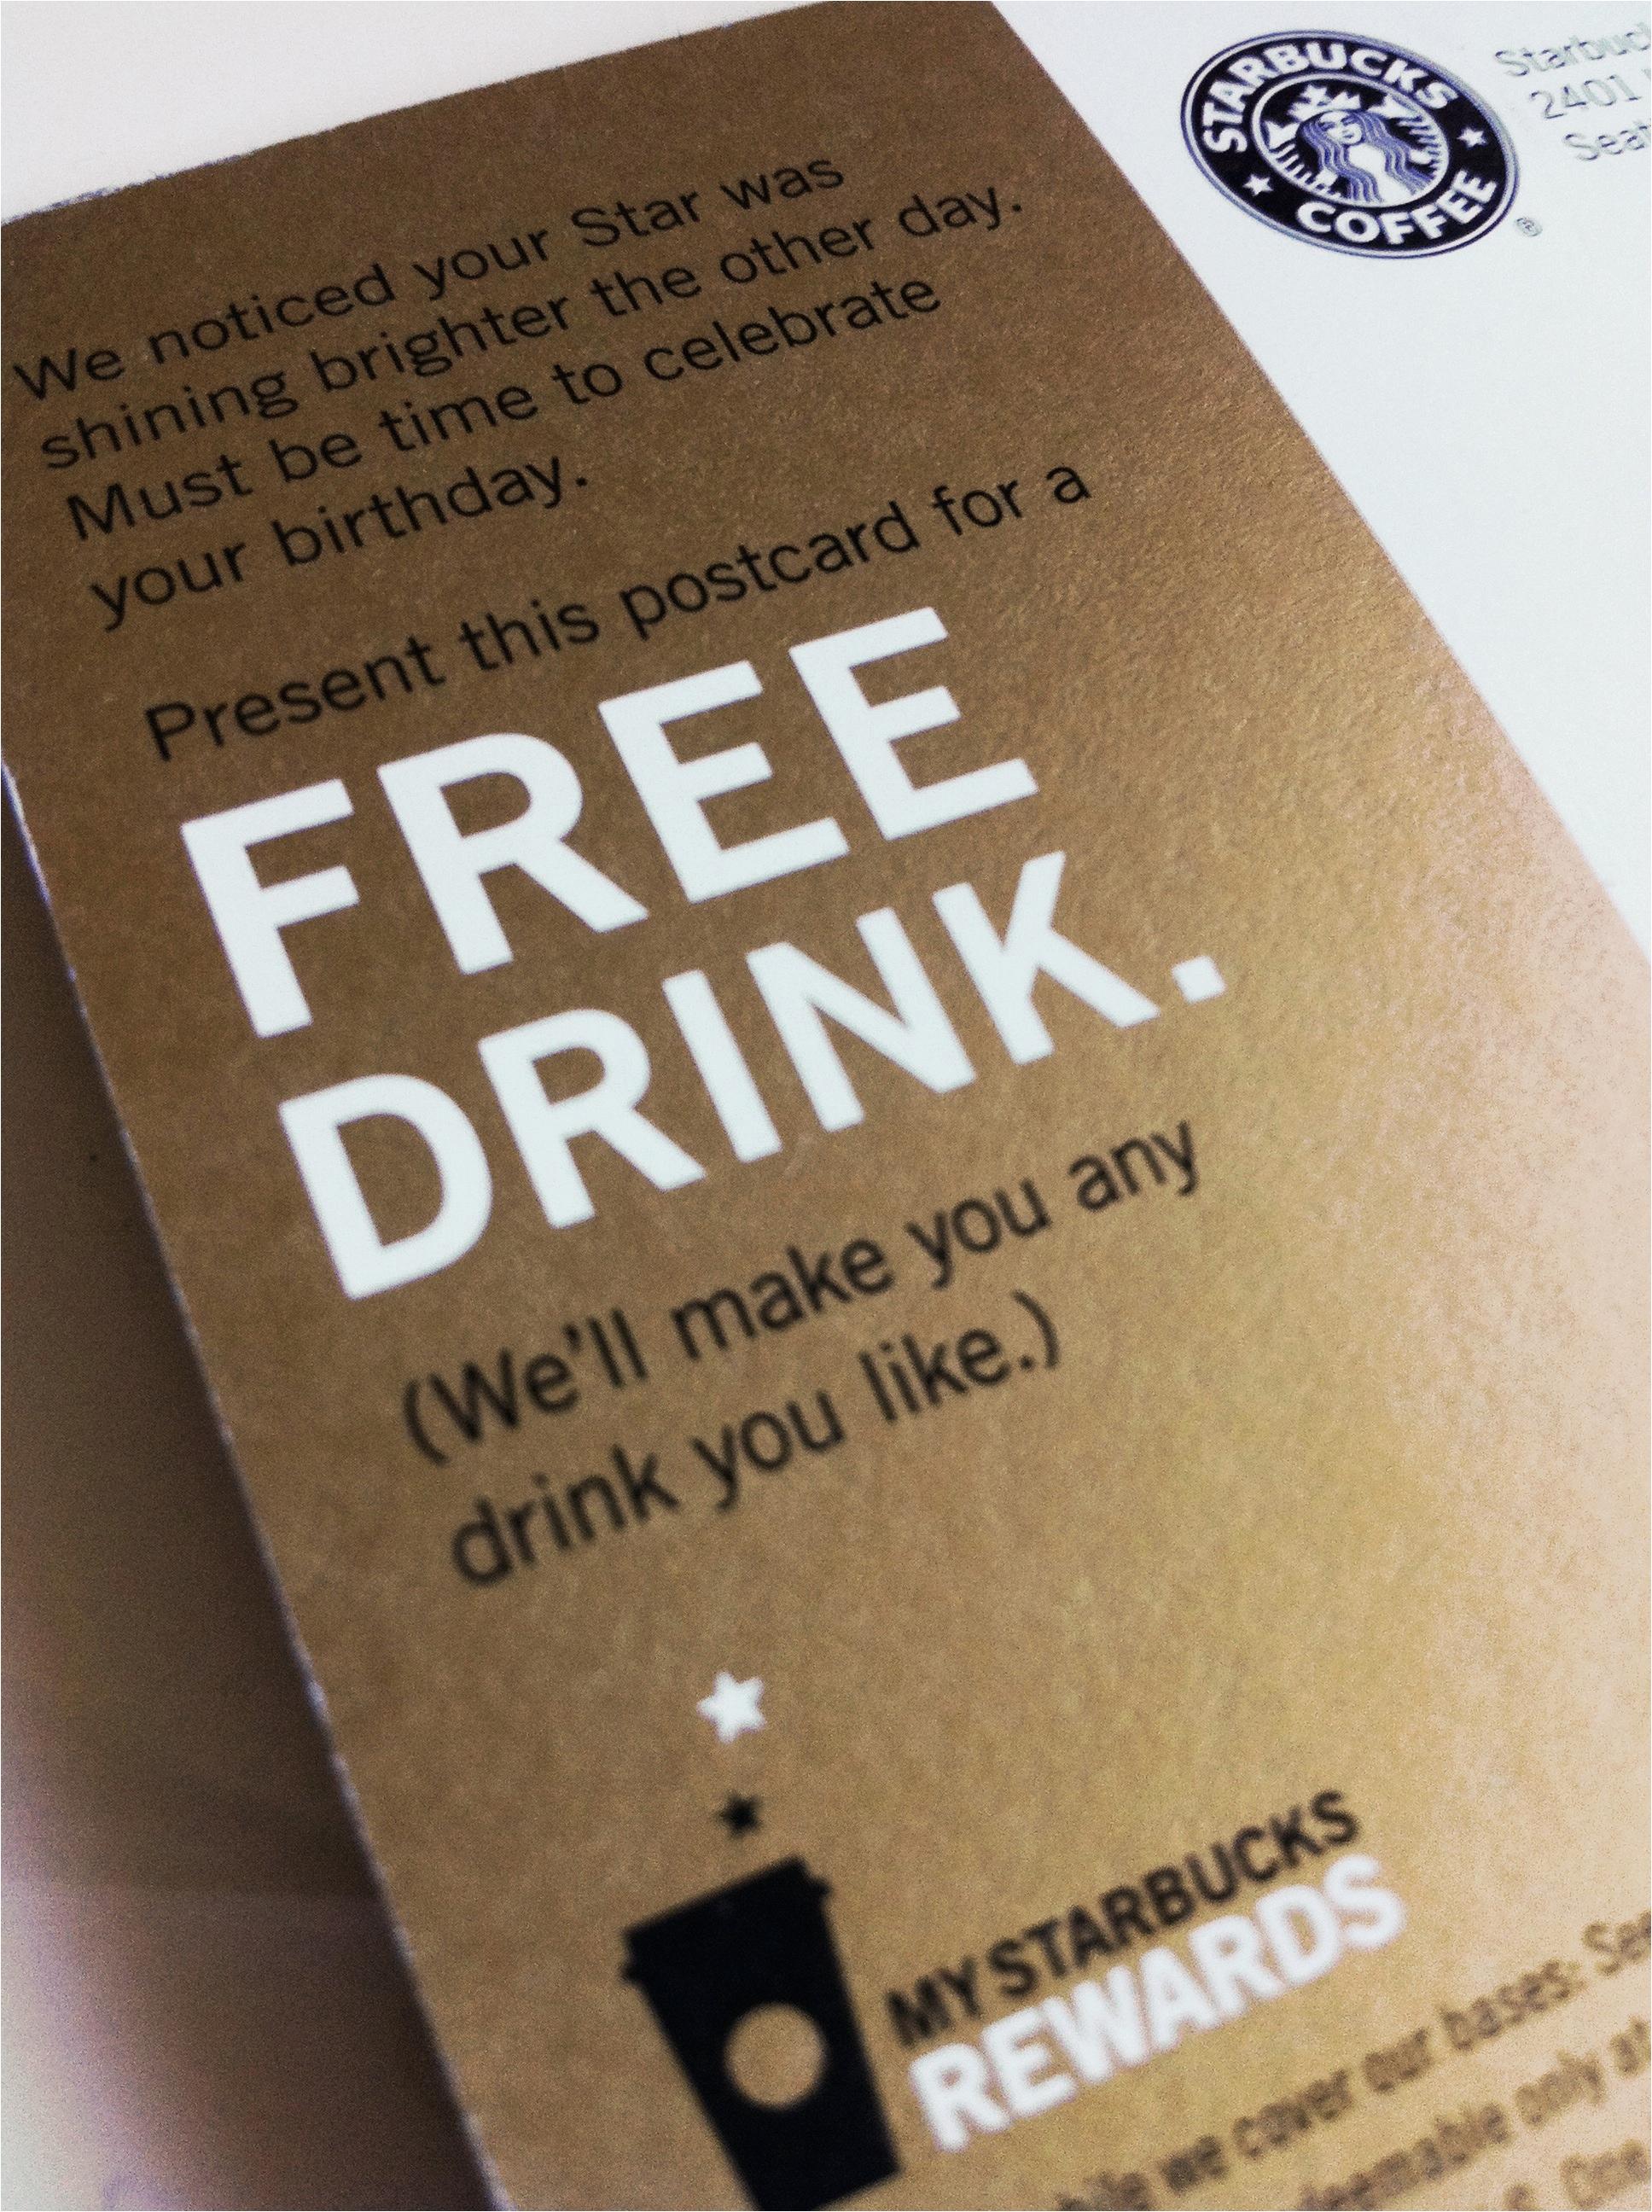 starbucks great designs and free drinks smilefelt